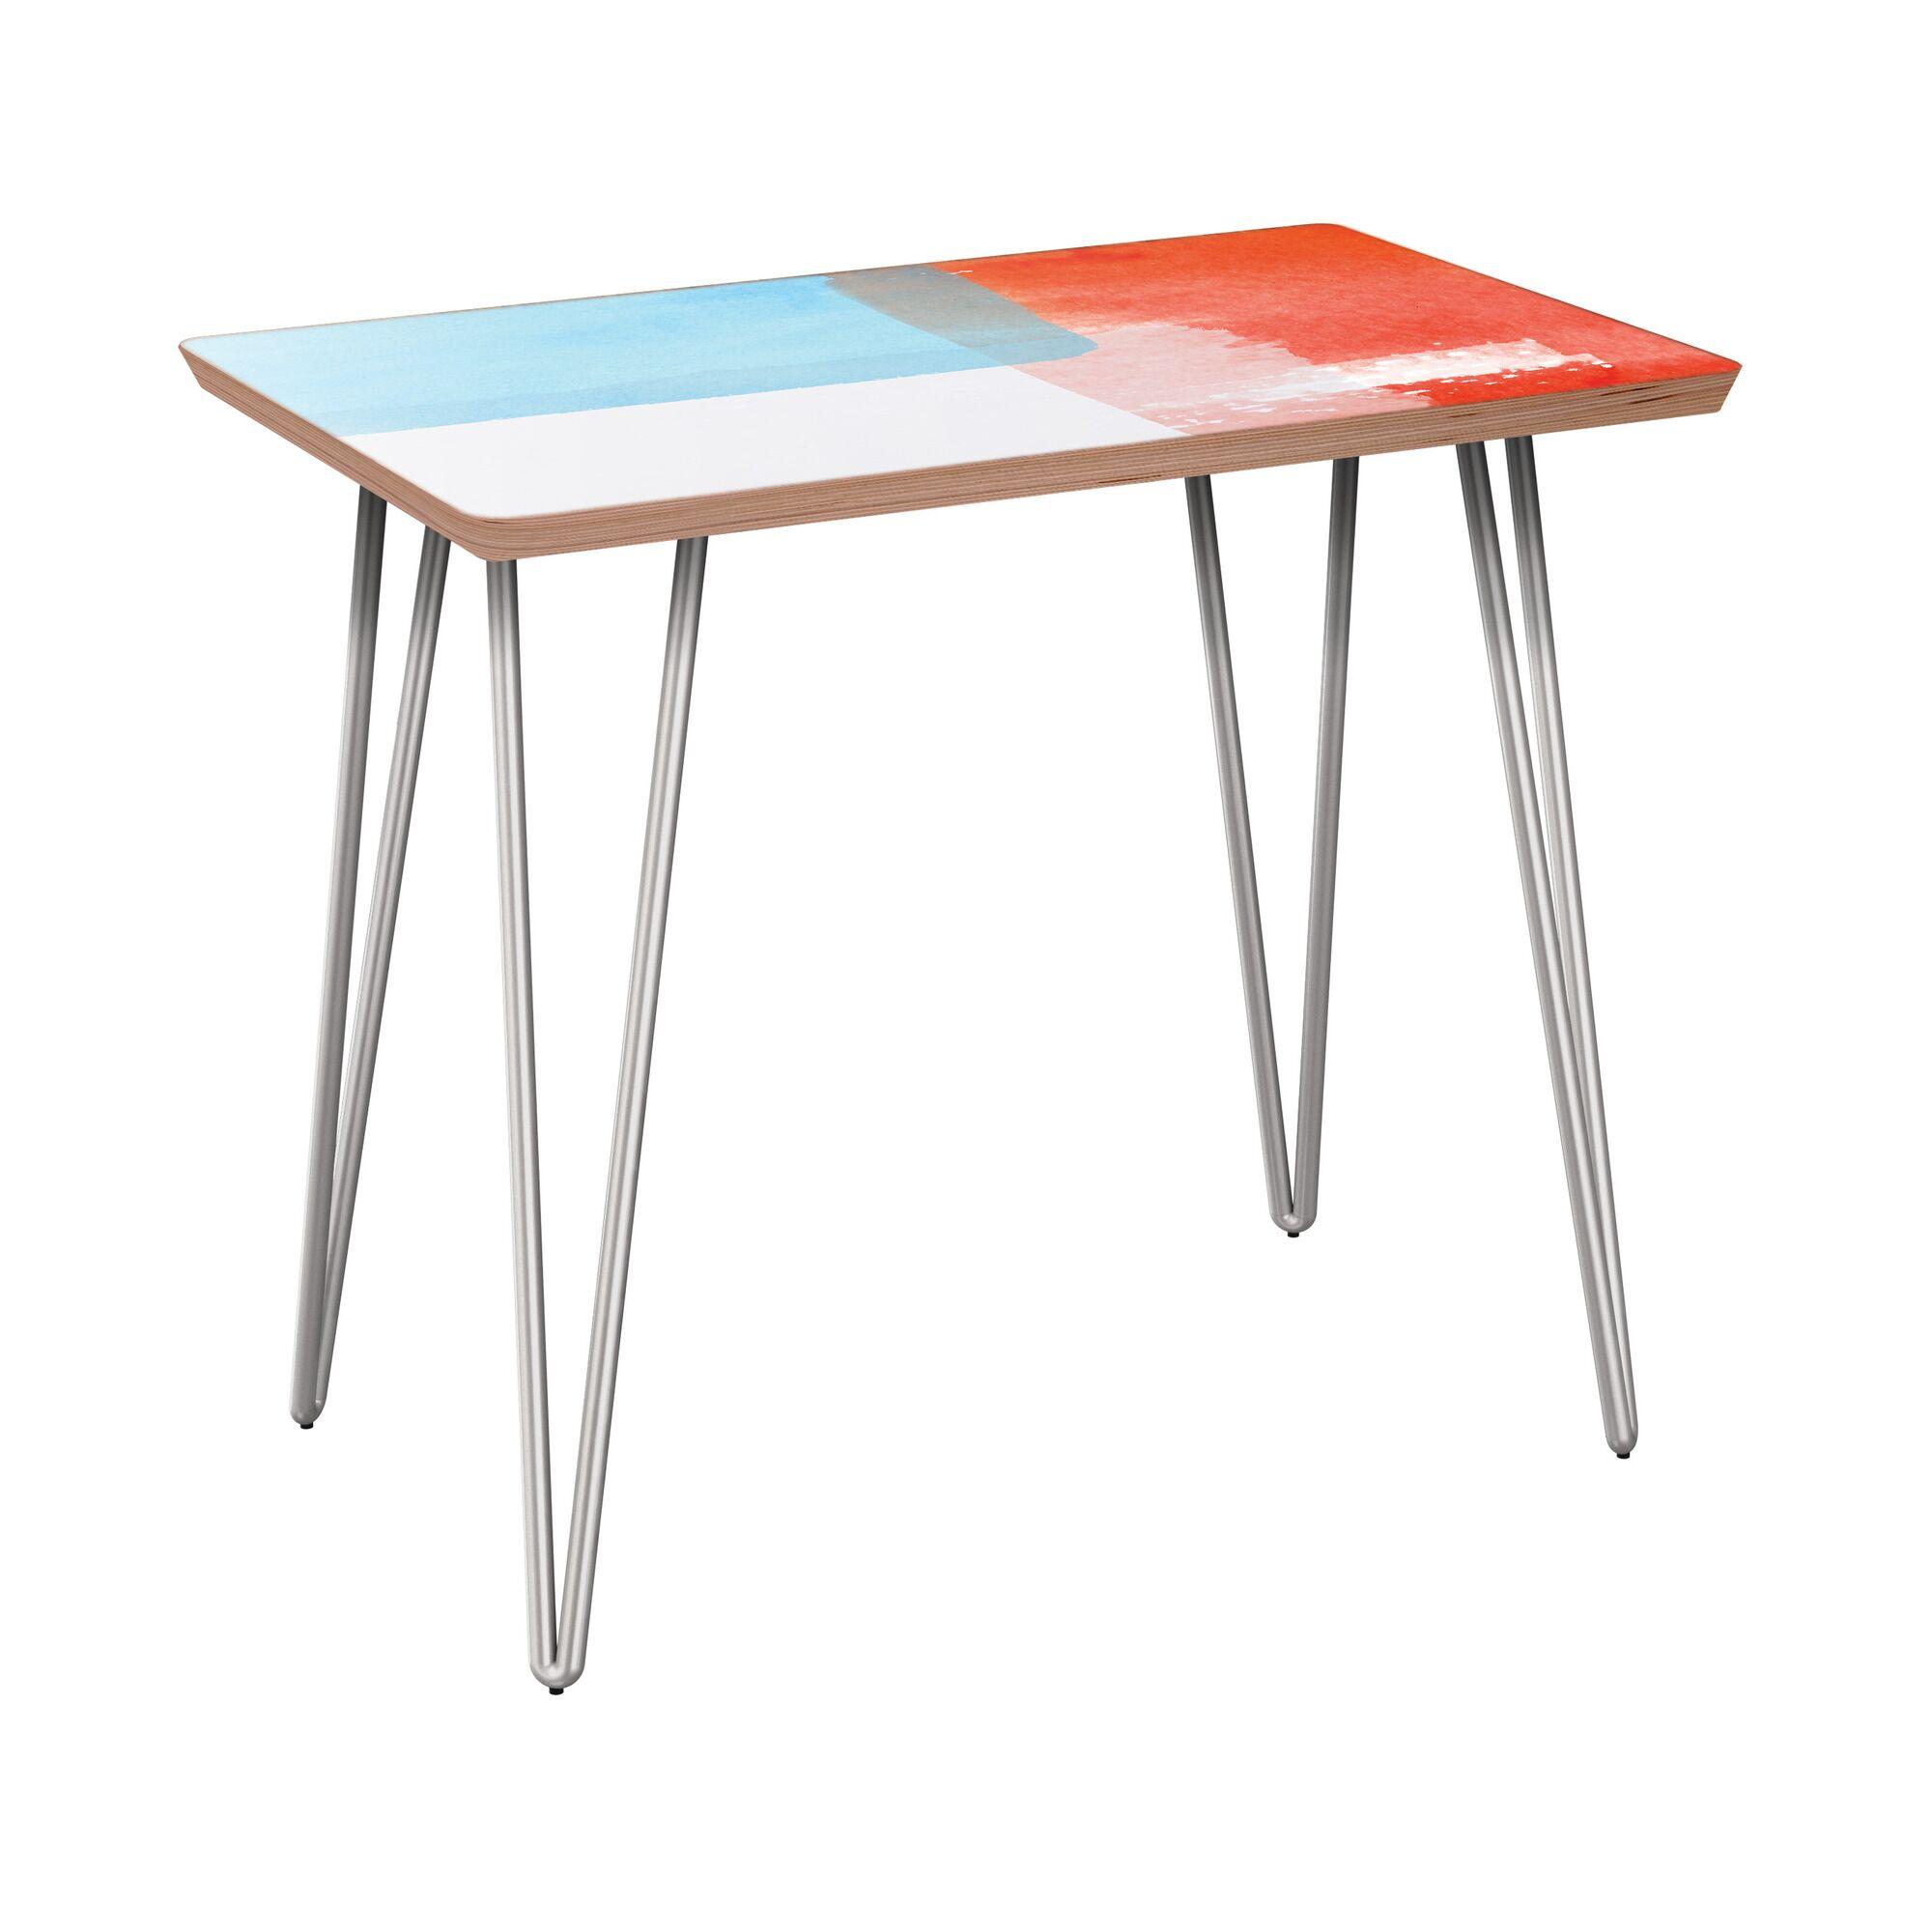 Esmont End Table Table Base Color: Chrome, Table Top Color: Walnut